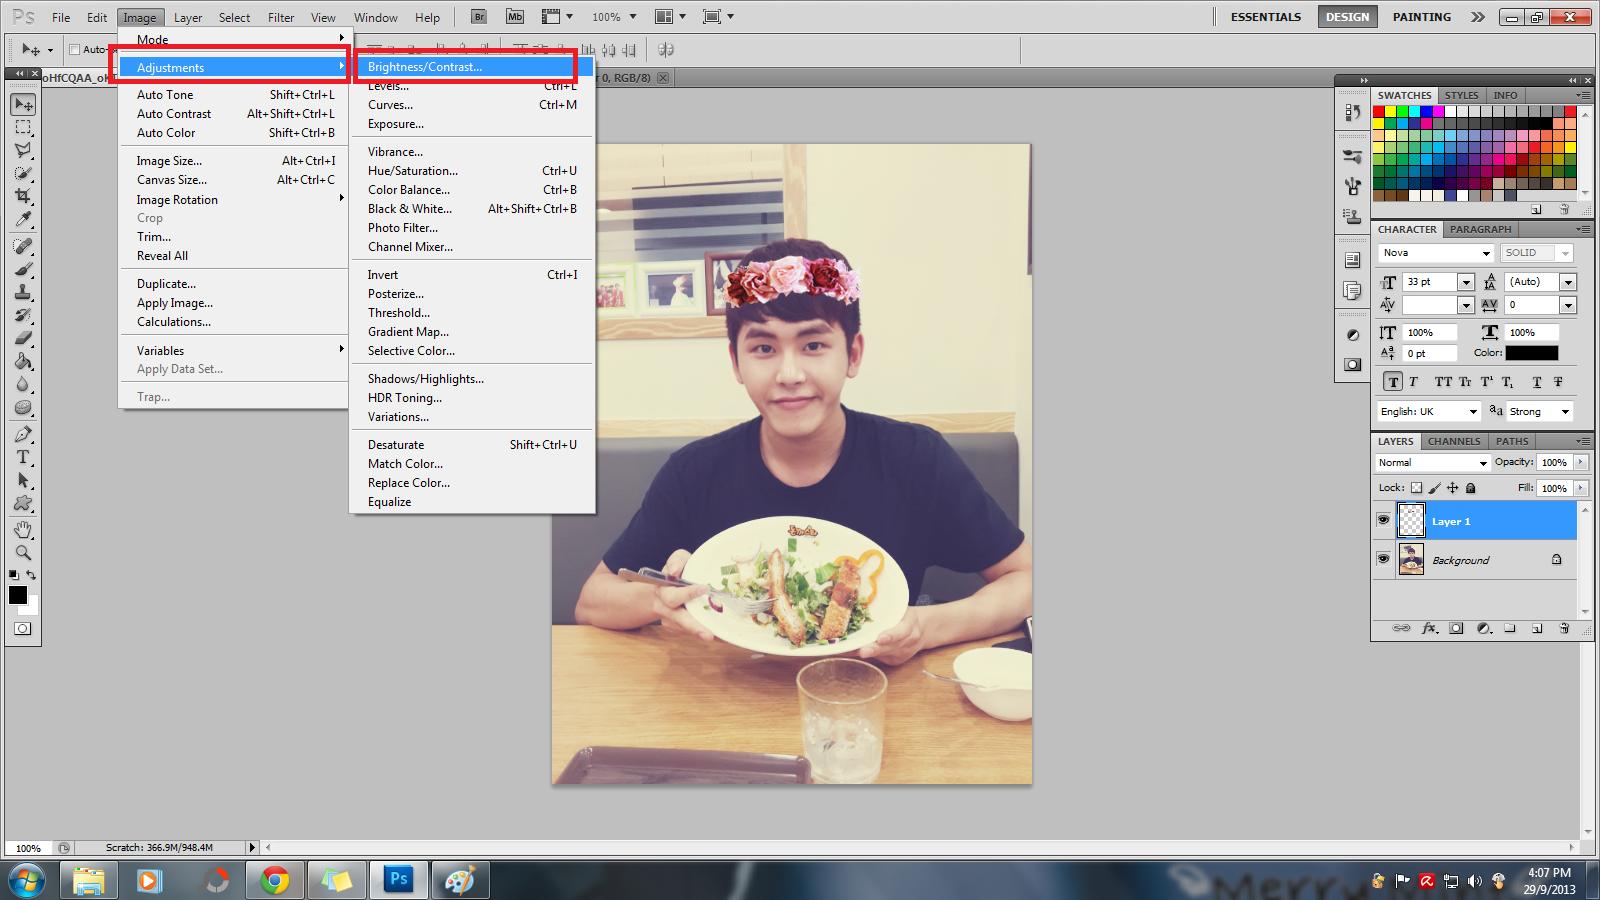 Untuk aku, aku akan gunakan gambar Hoya as model.